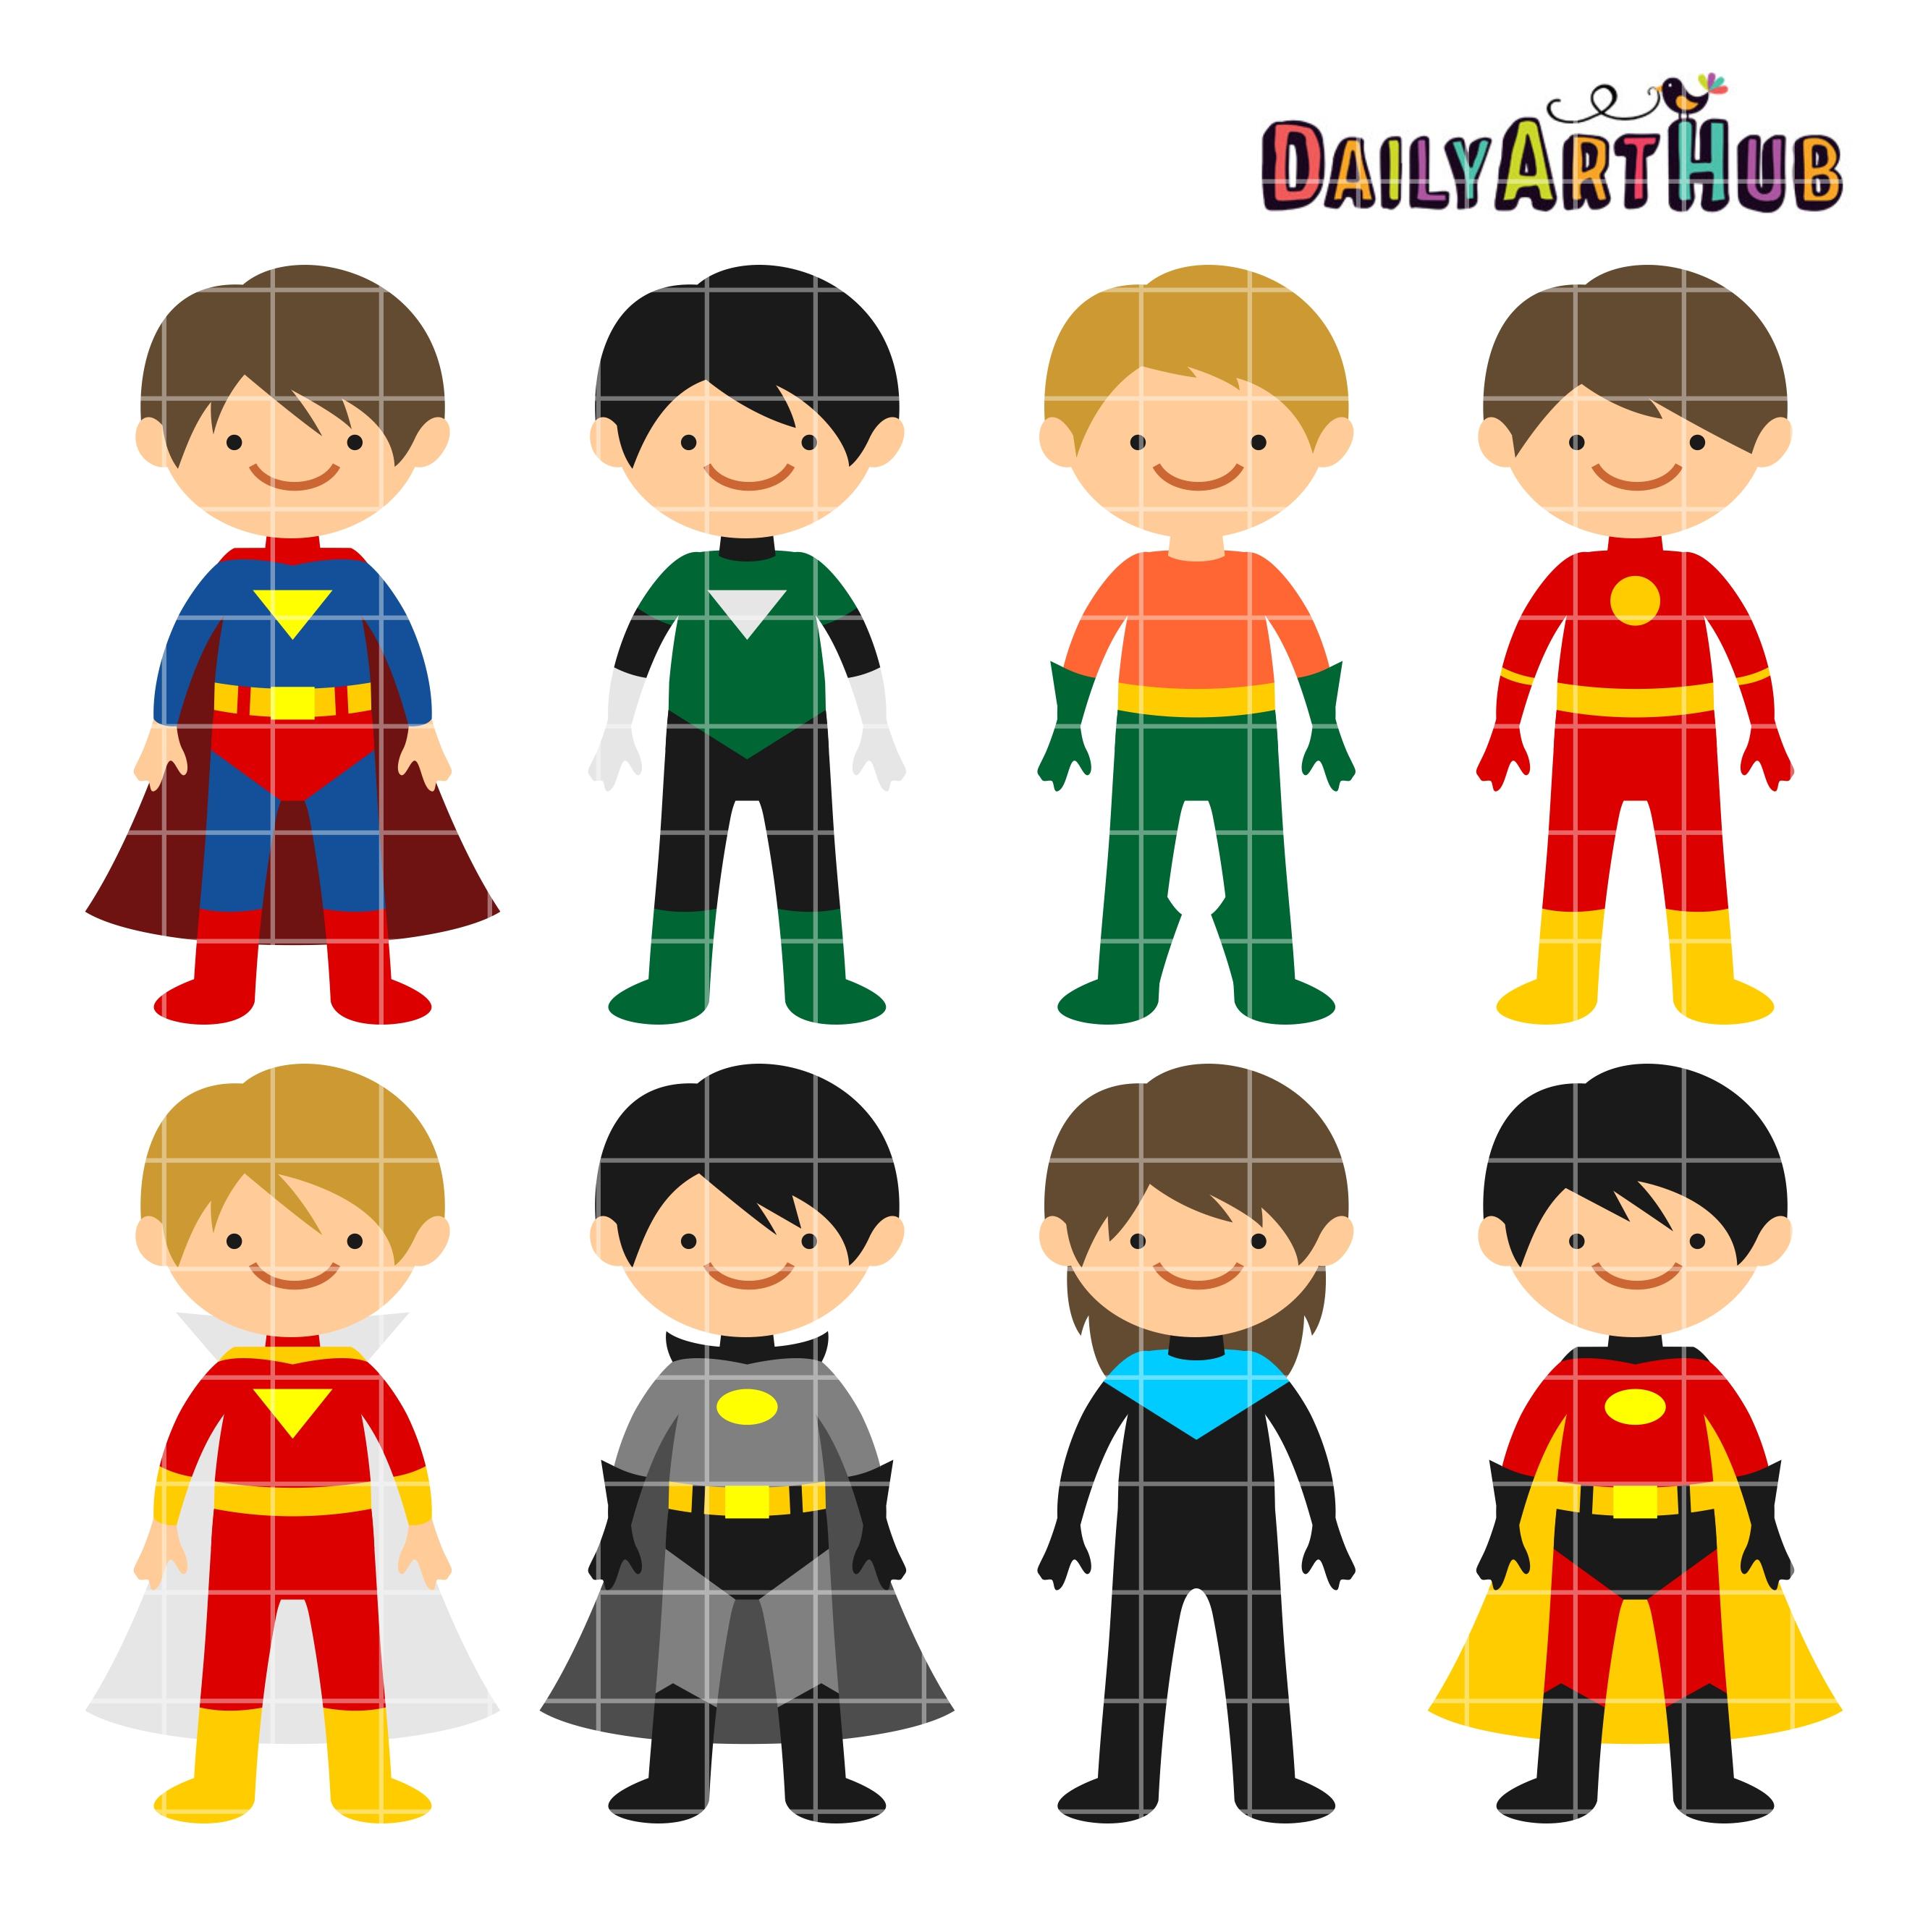 superhero boys clip art set daily art hub free clip art everyday rh dailyarthub com Free Friendship Word Clip Art free friendship clipart images